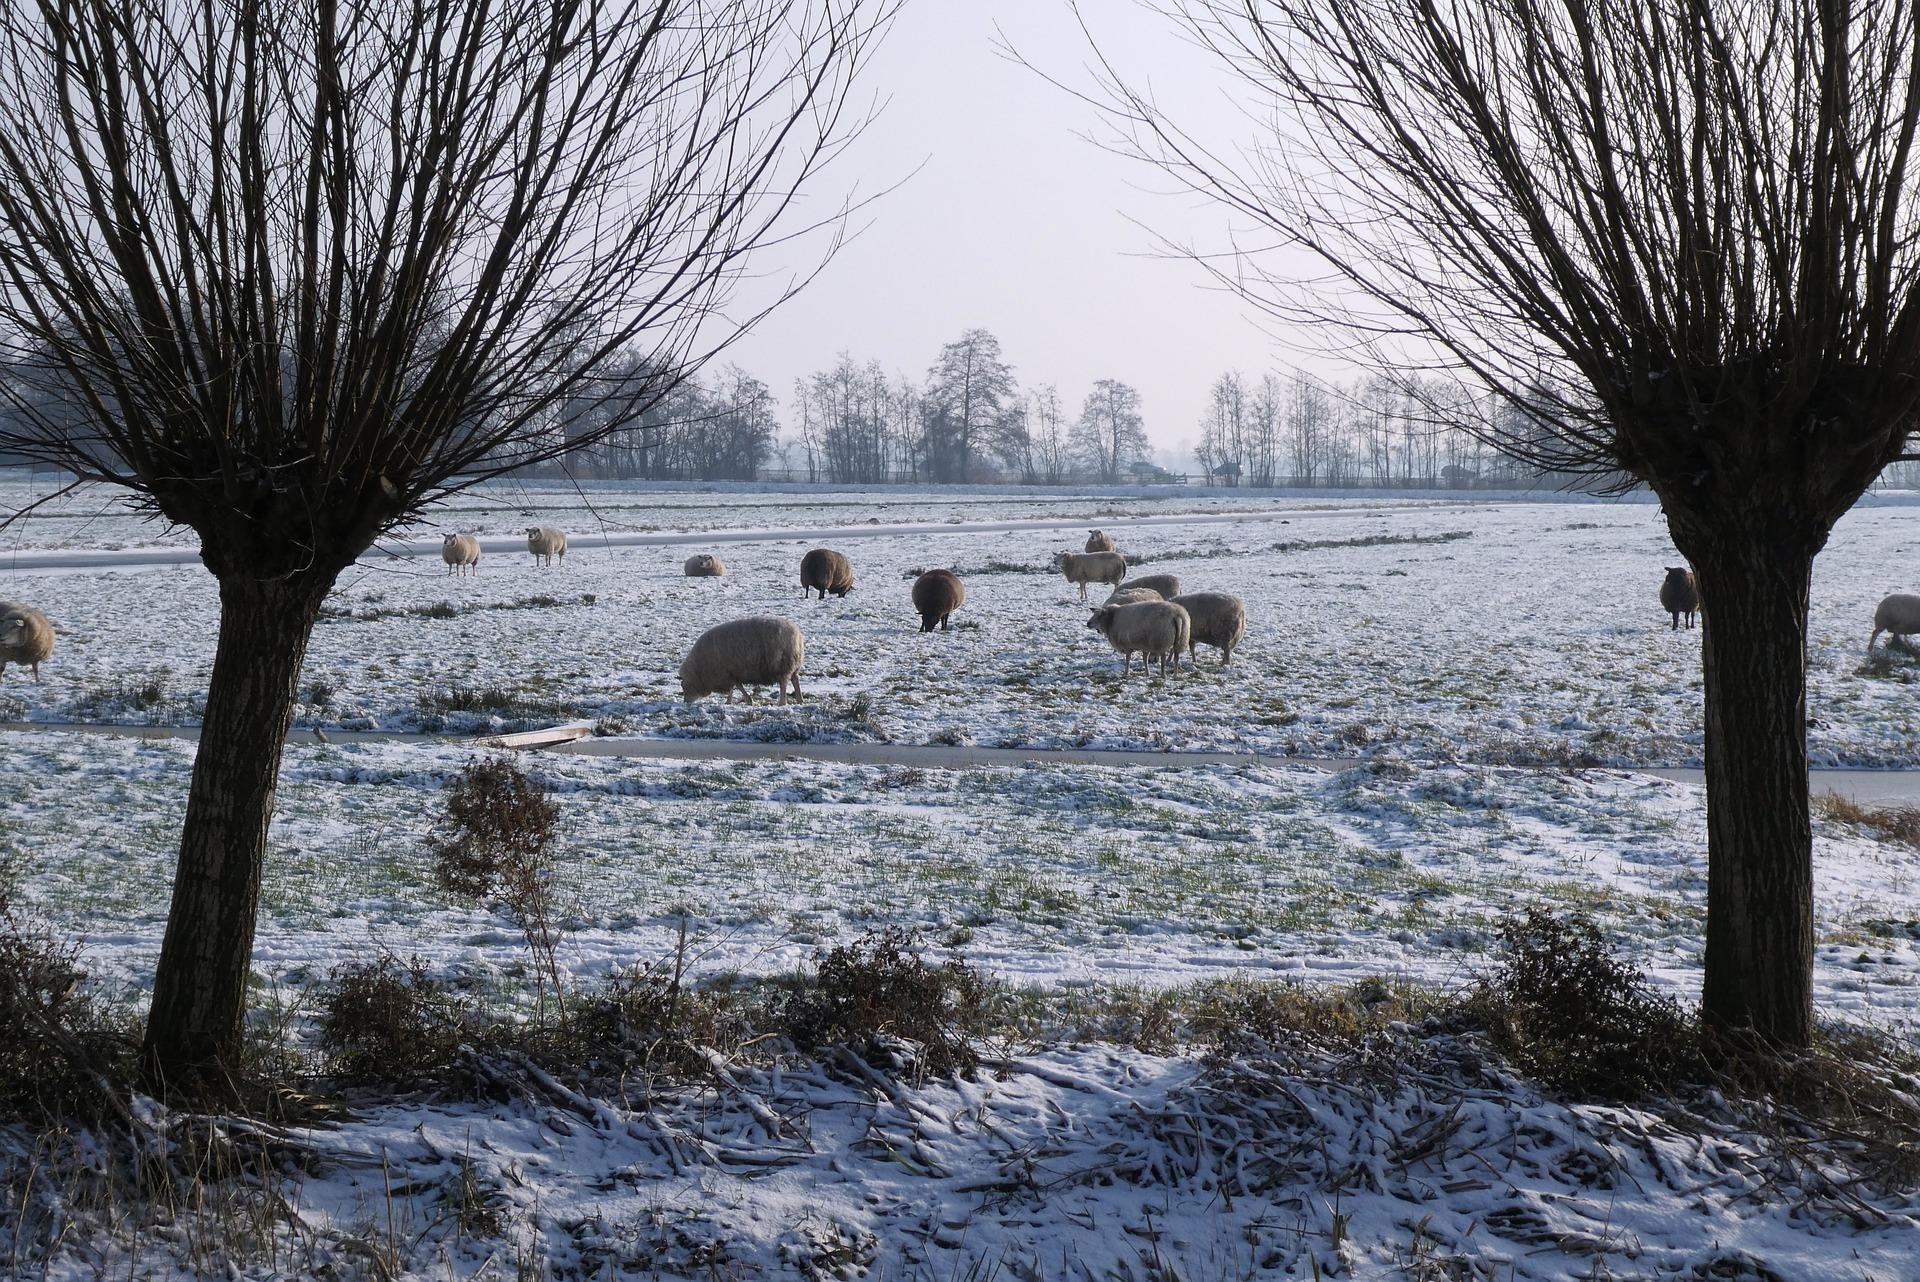 Razas de oveja en la nieve